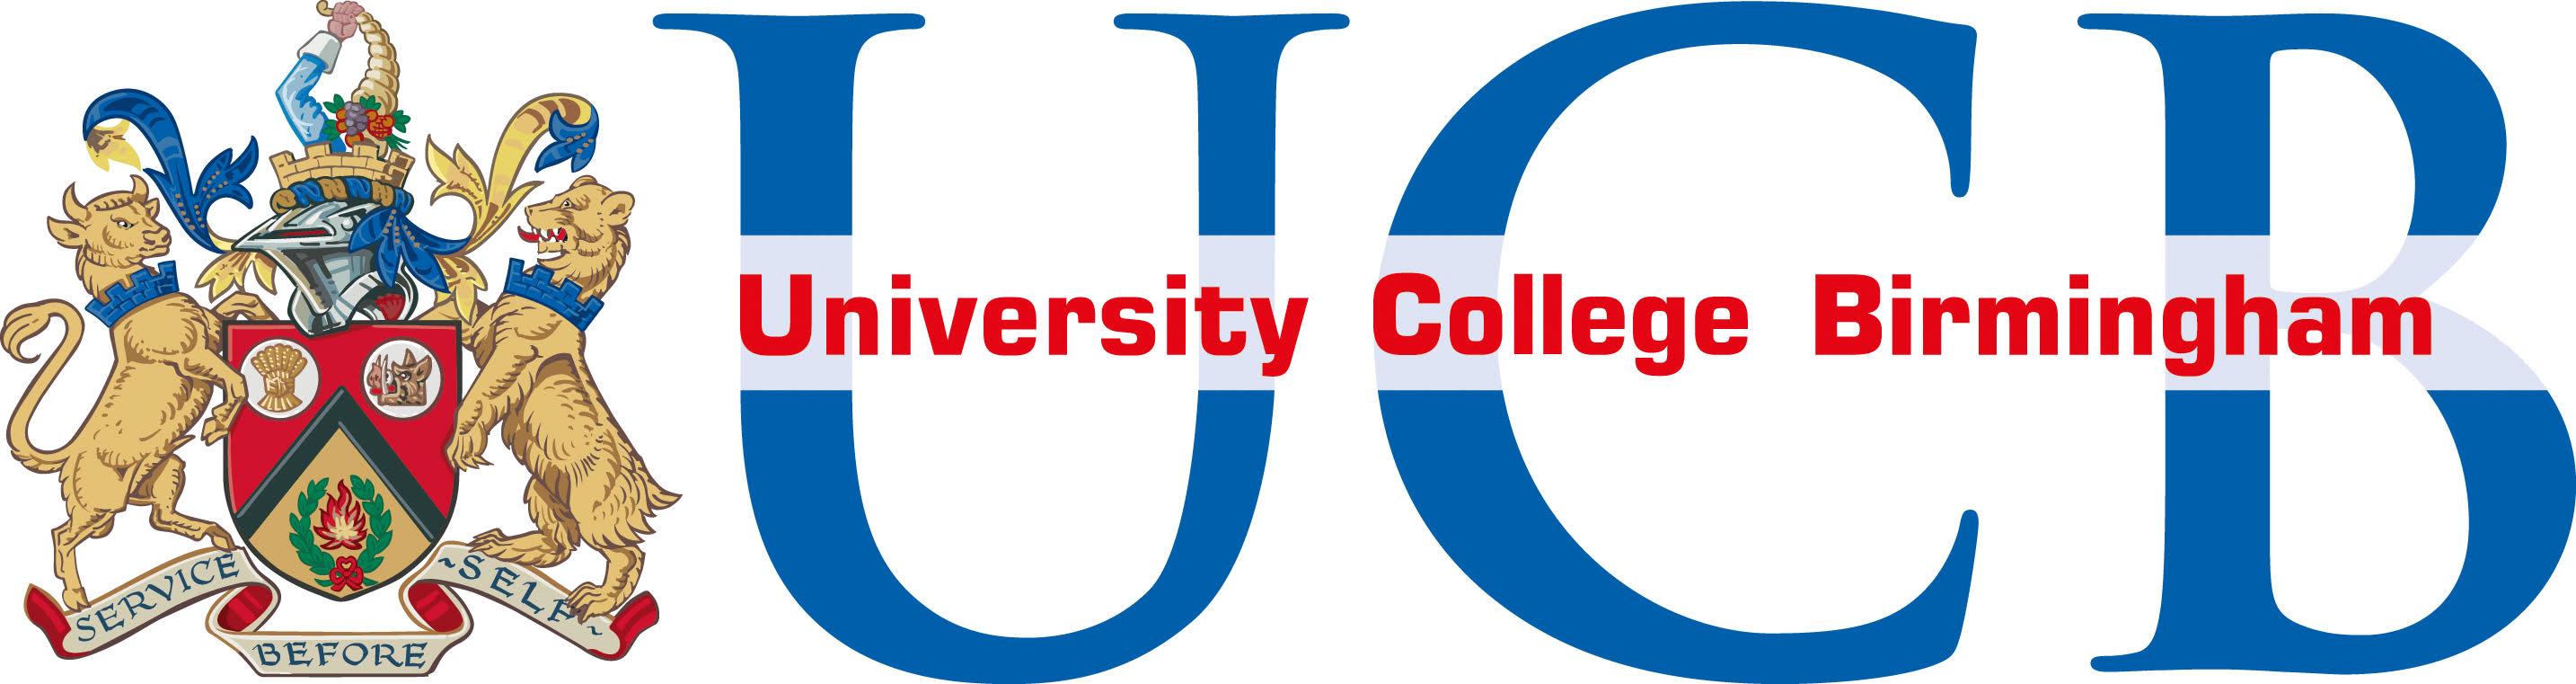 University-College-Birmingham